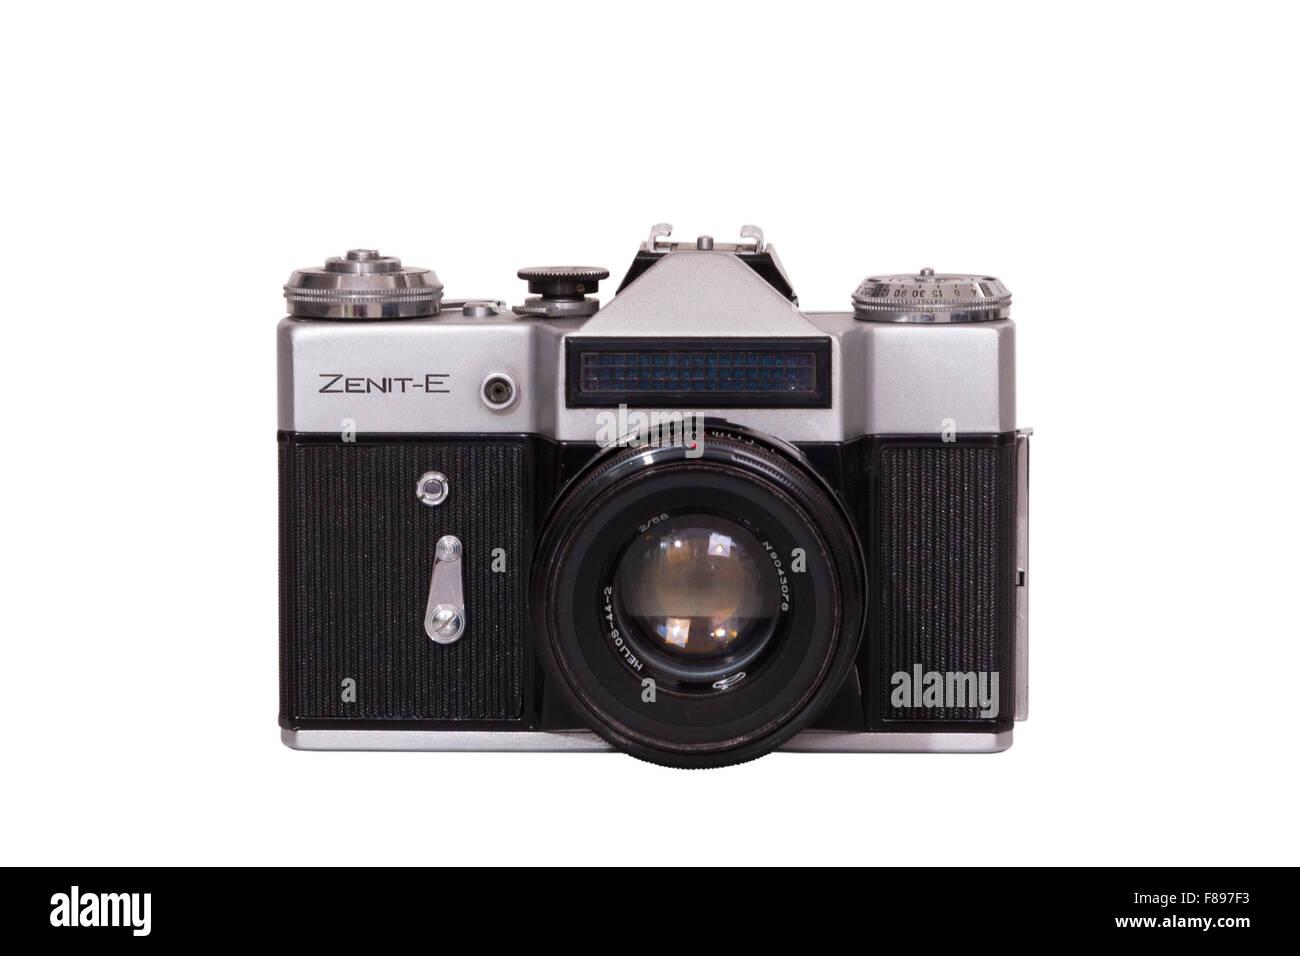 Zenith E / Zenit E single lens reflex SLR from Soviet Union Russia / USSR / Russian made classic amateur 35mm manual - Stock Image